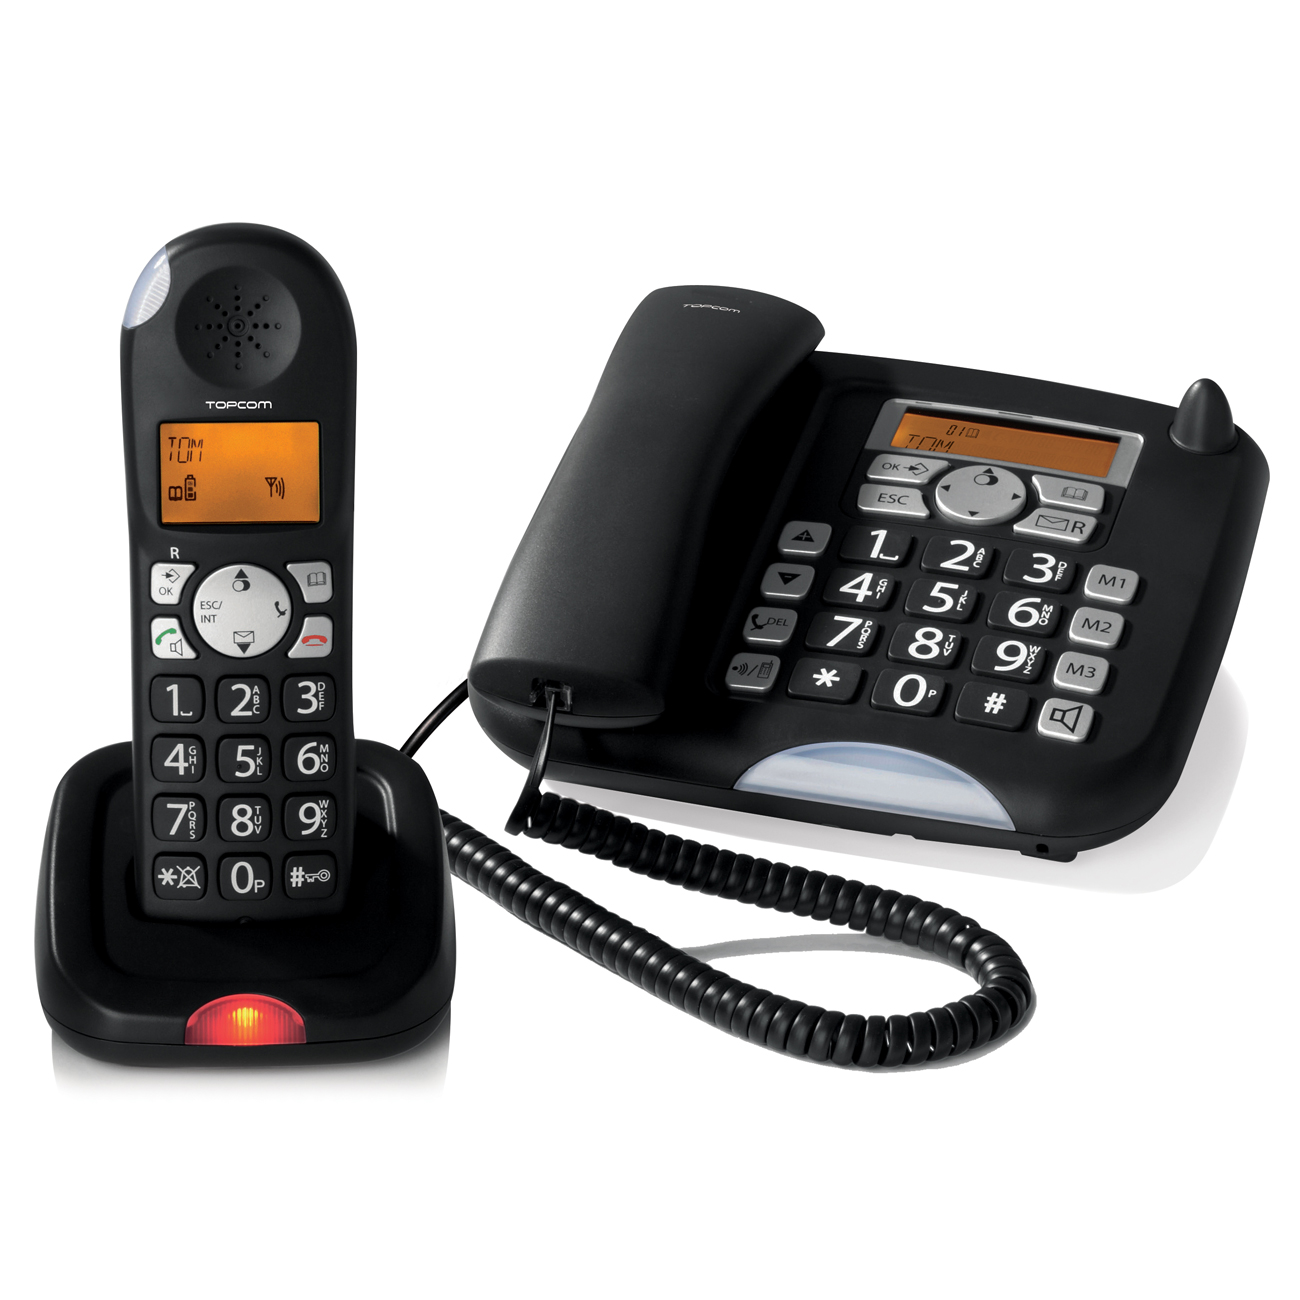 Téléphone filaire Topcom Butler 901 Combo Téléphone filaire + téléphone sans fil DECT